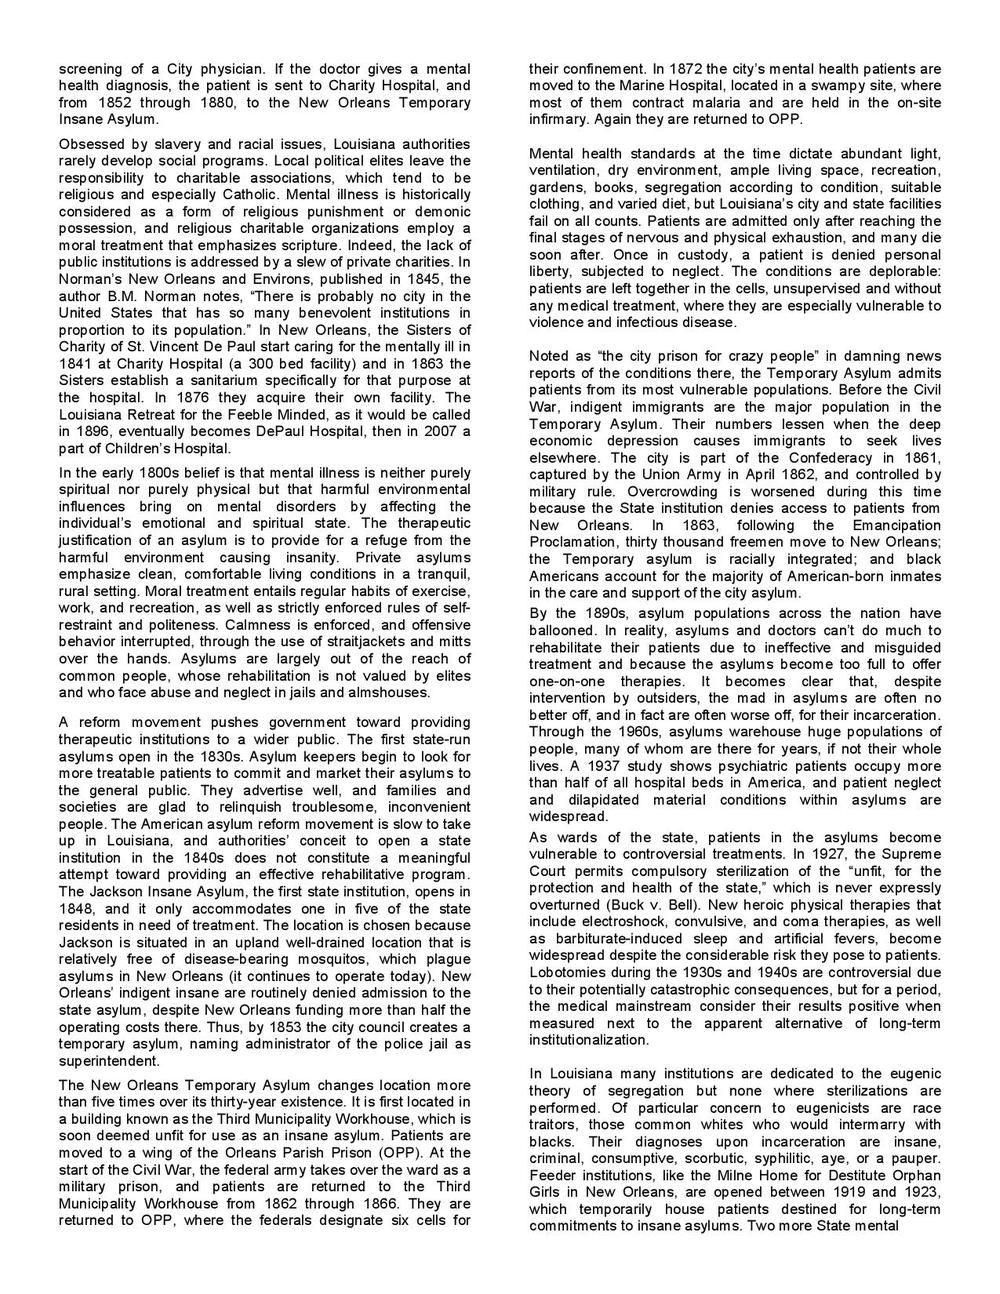 Timeline-page-004.jpg